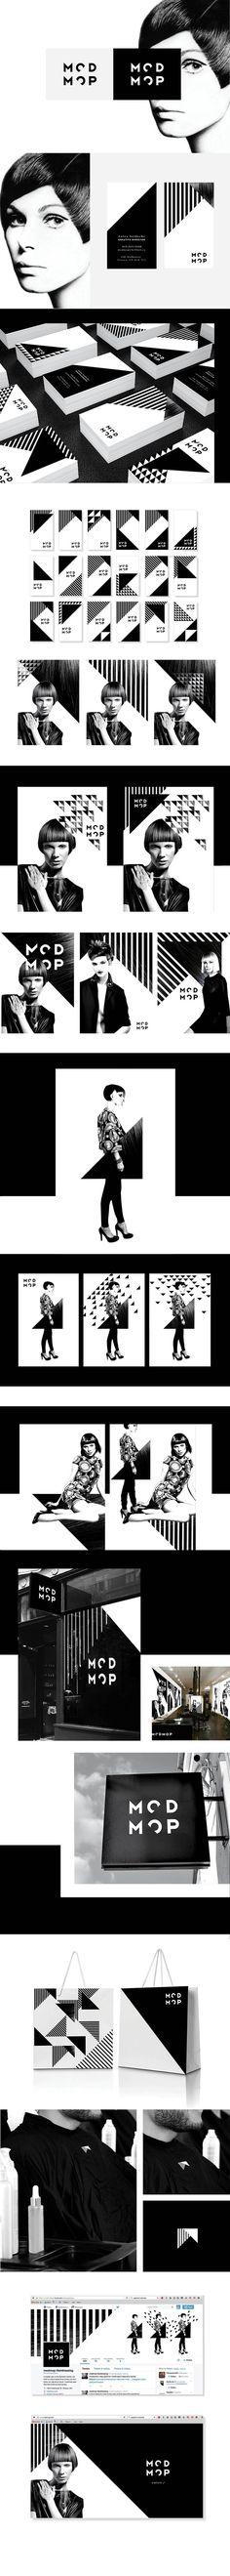 Alex Nereuta on Behance   hair salon logo & identity  https://www.behance.net/gallery/31569671/Modmop-Identity